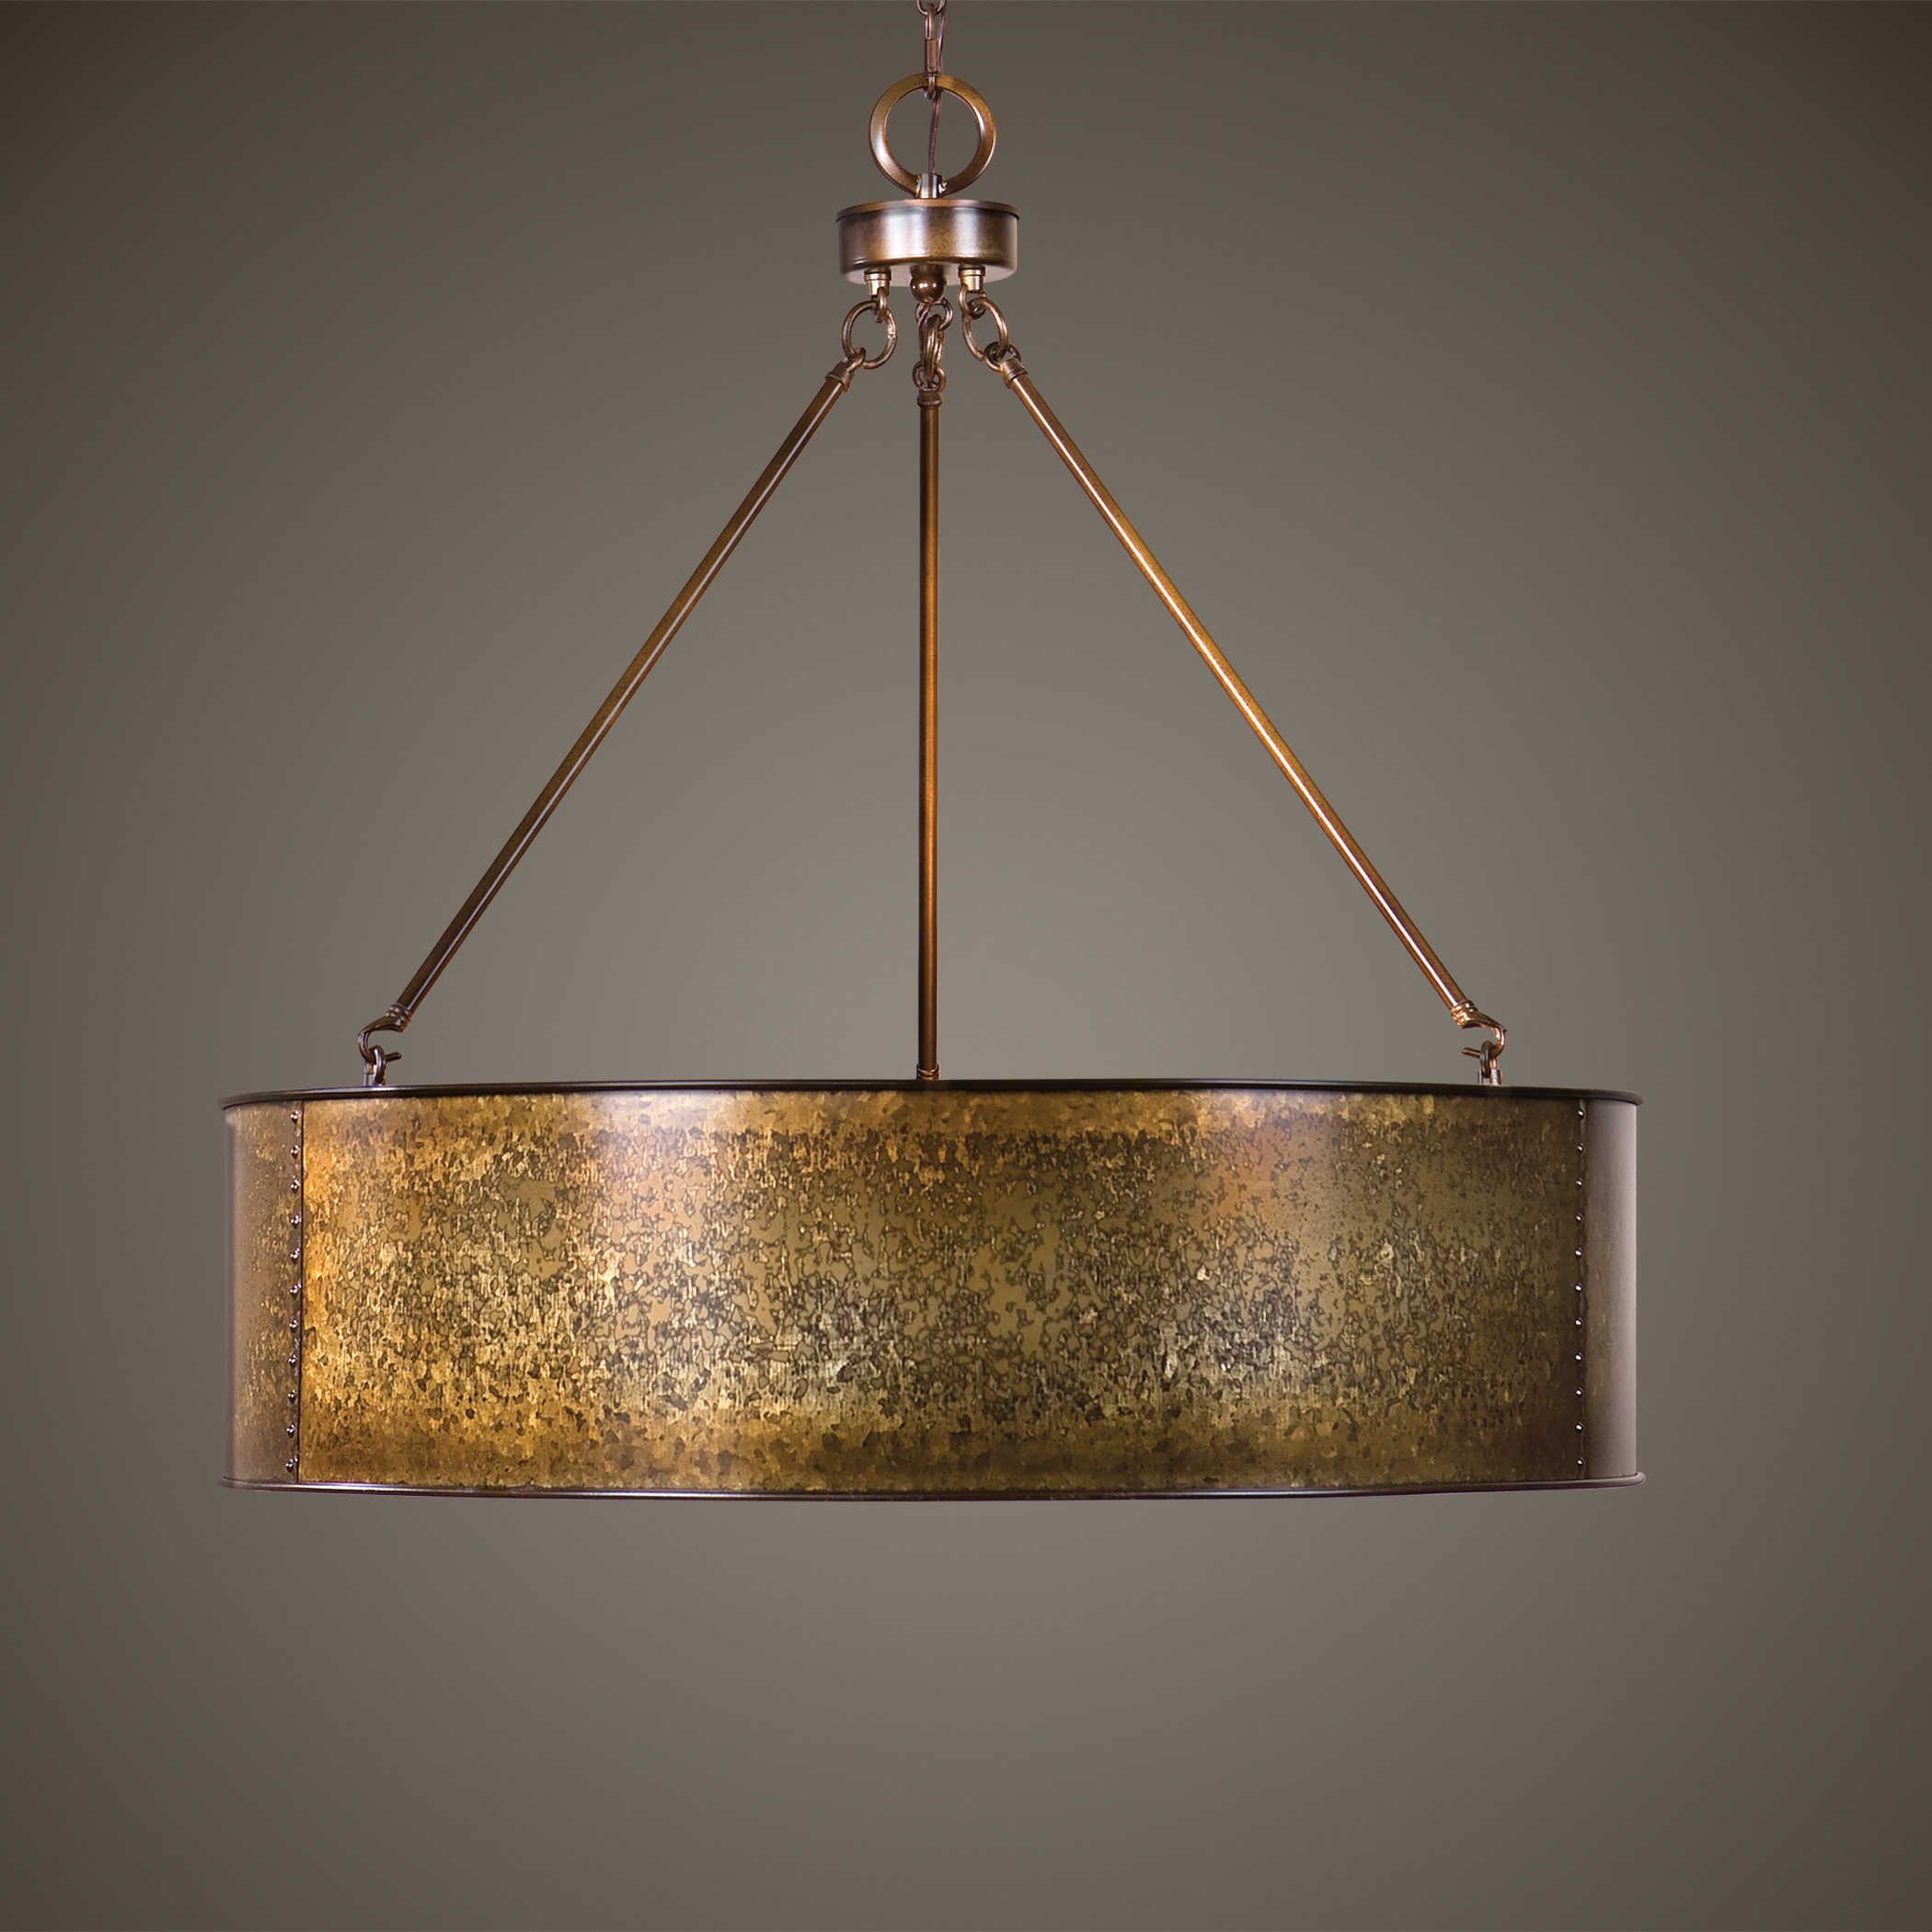 Wolcott 5 Light Golden Pendant Carolyn Kinder International